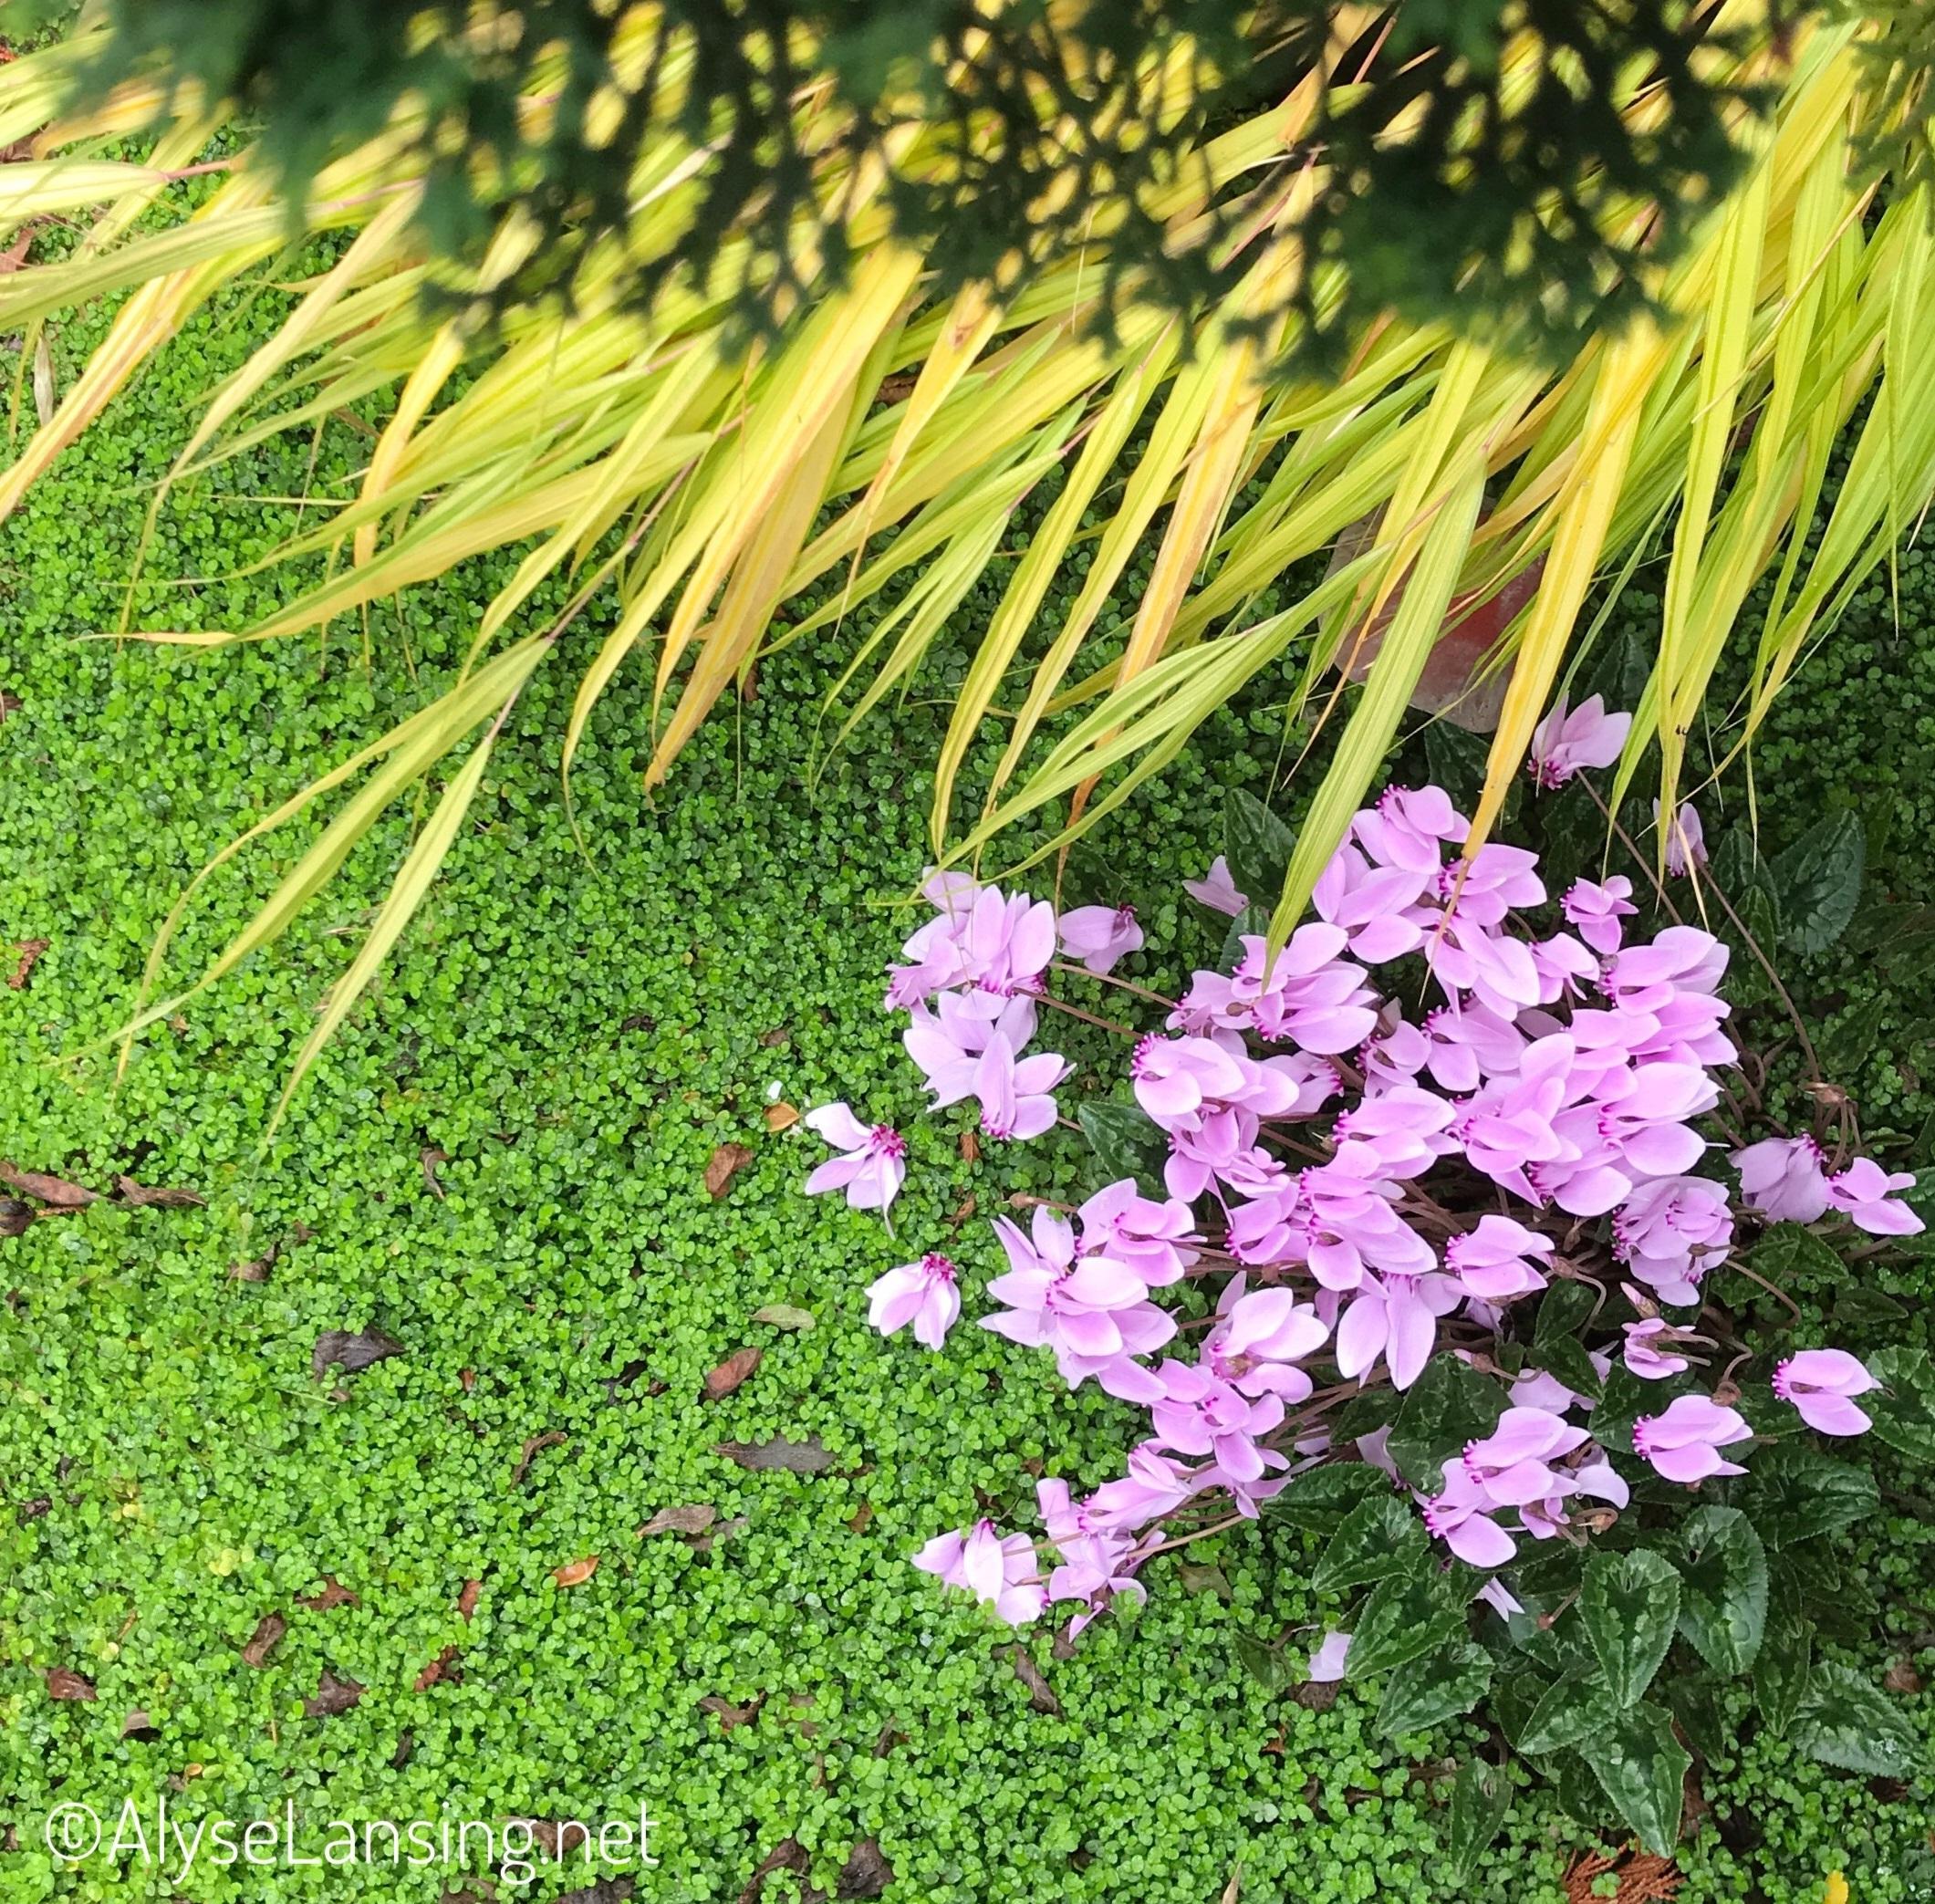 Cyclamen hederifolium with Japanese Forest Grass (Hakonechloa macra 'Aurela') and Baby's Tears (Soleirolia soleirolii), October 2017.